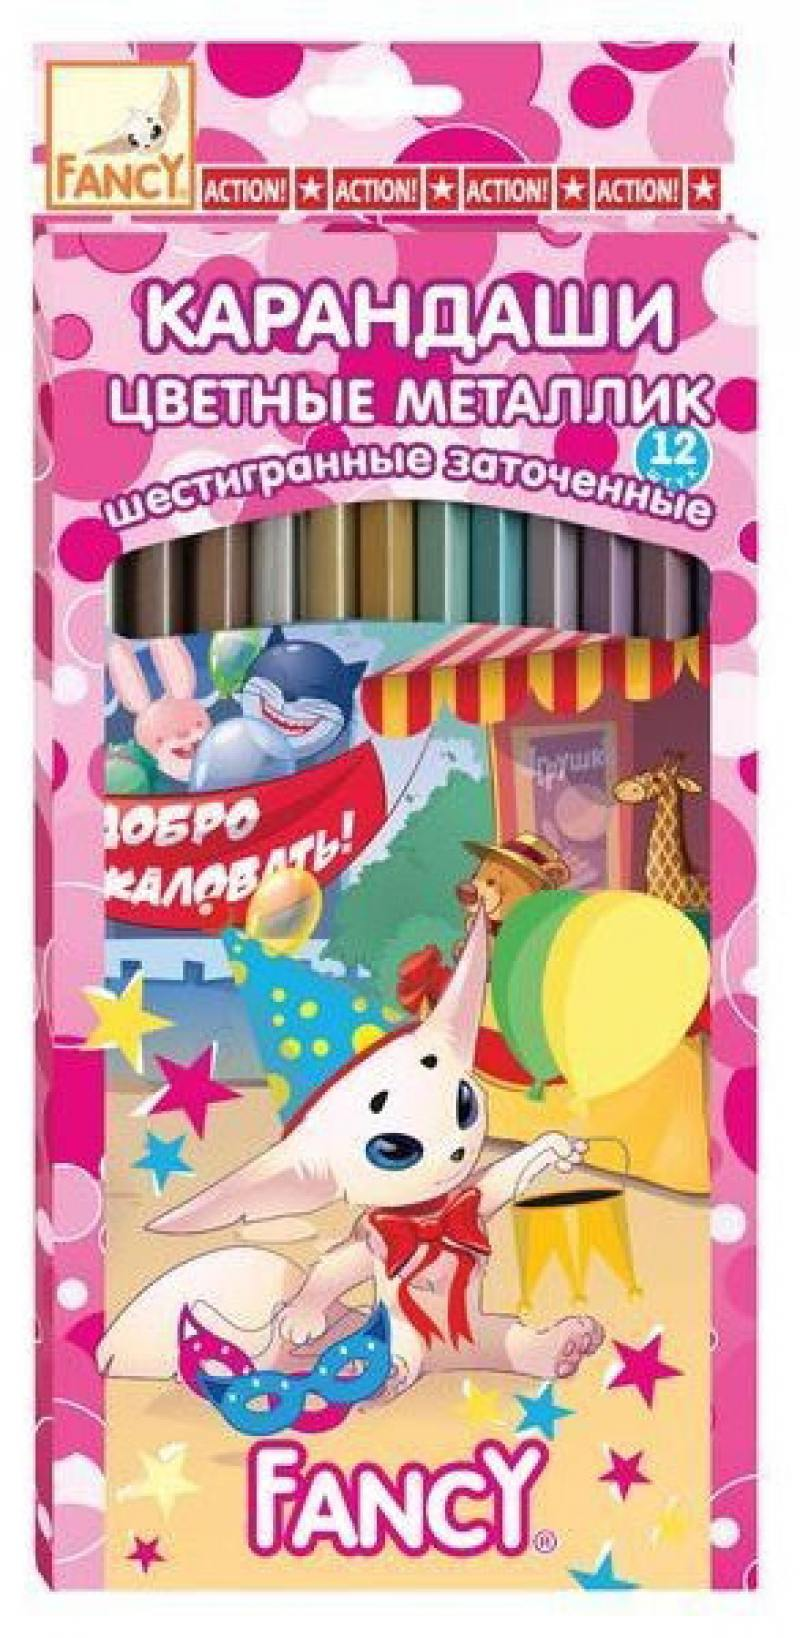 Набор цветных карандашей Action! Fancy 12 шт FCP201-12 FCP201-12 рубашка silvian heach kids рубашка